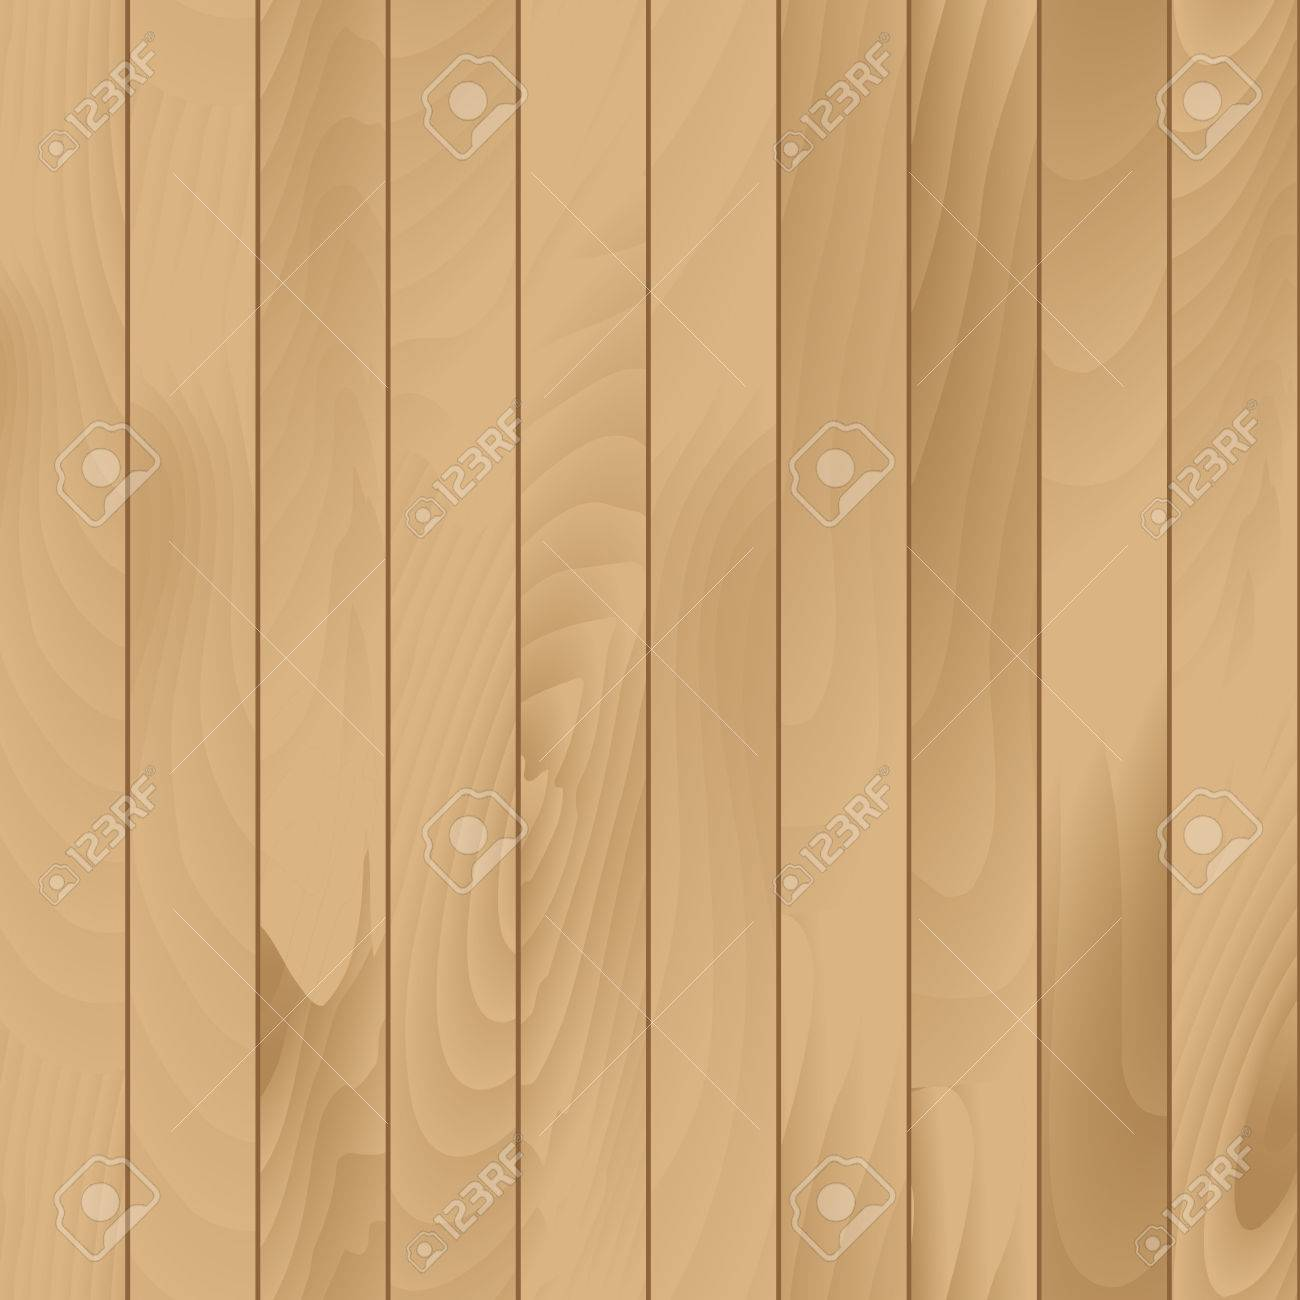 wood plank texture seamless. Vector - Illustration Of Seamless Wood Plank Texture Background